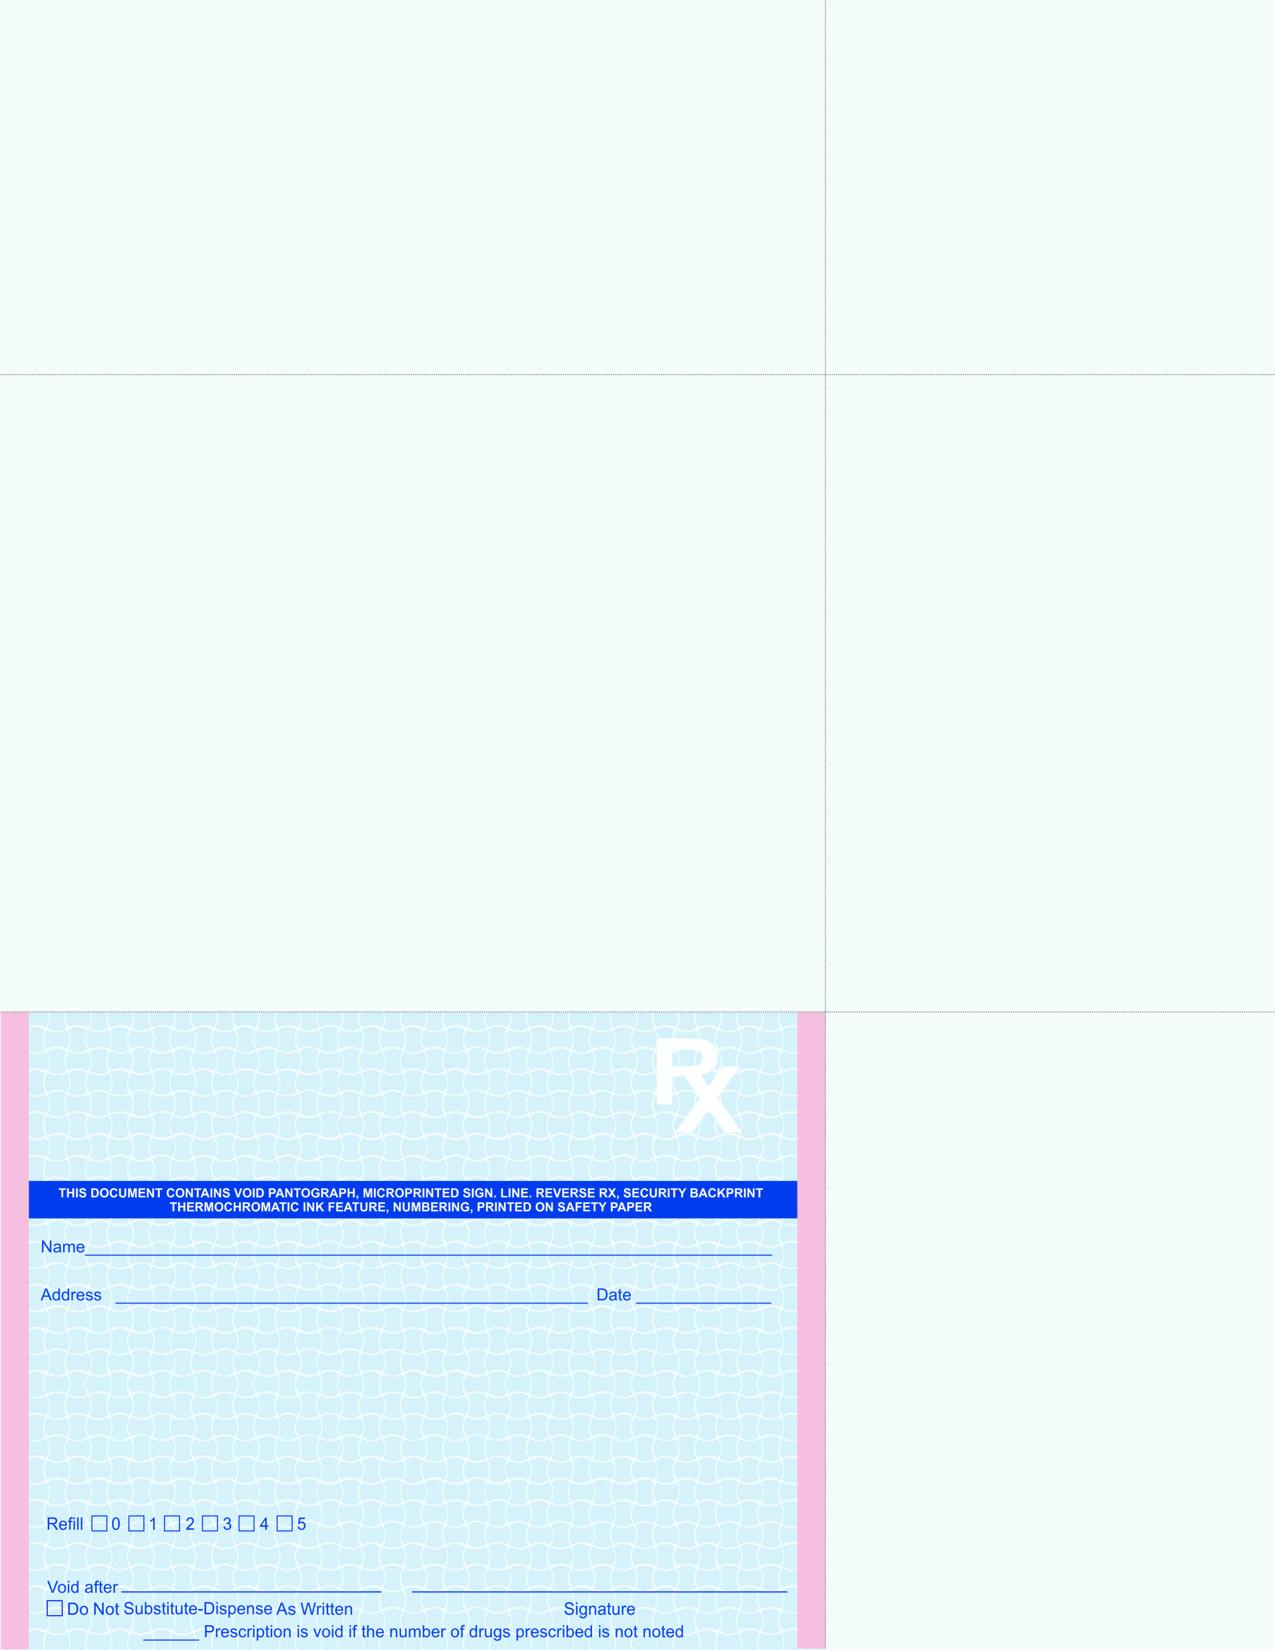 California Rx Pad Work Sheet